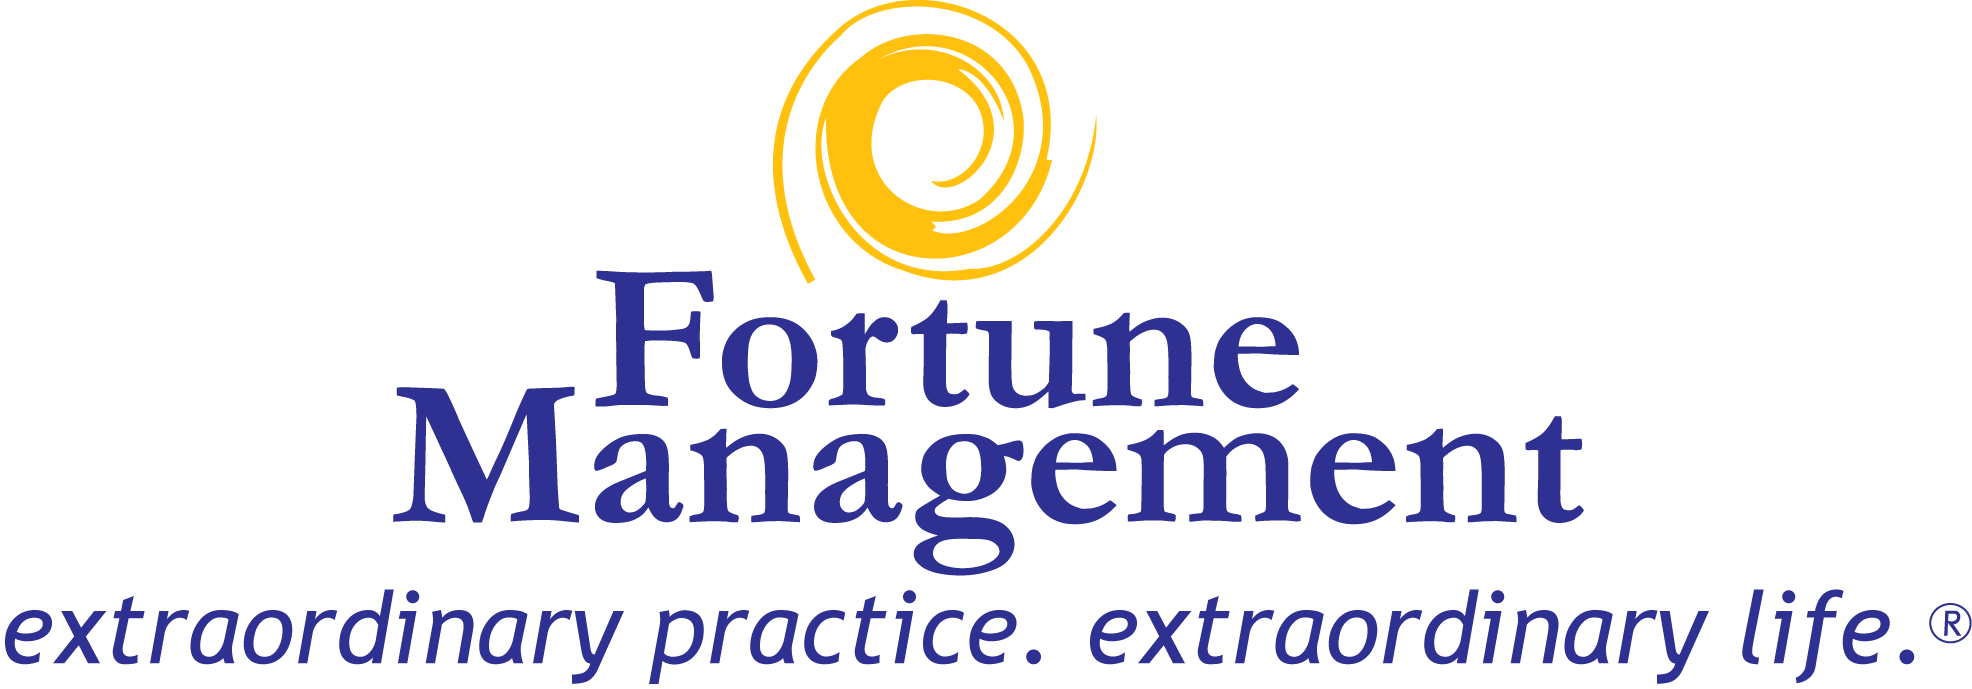 Fortune Management Ict Medical And Dental Technology